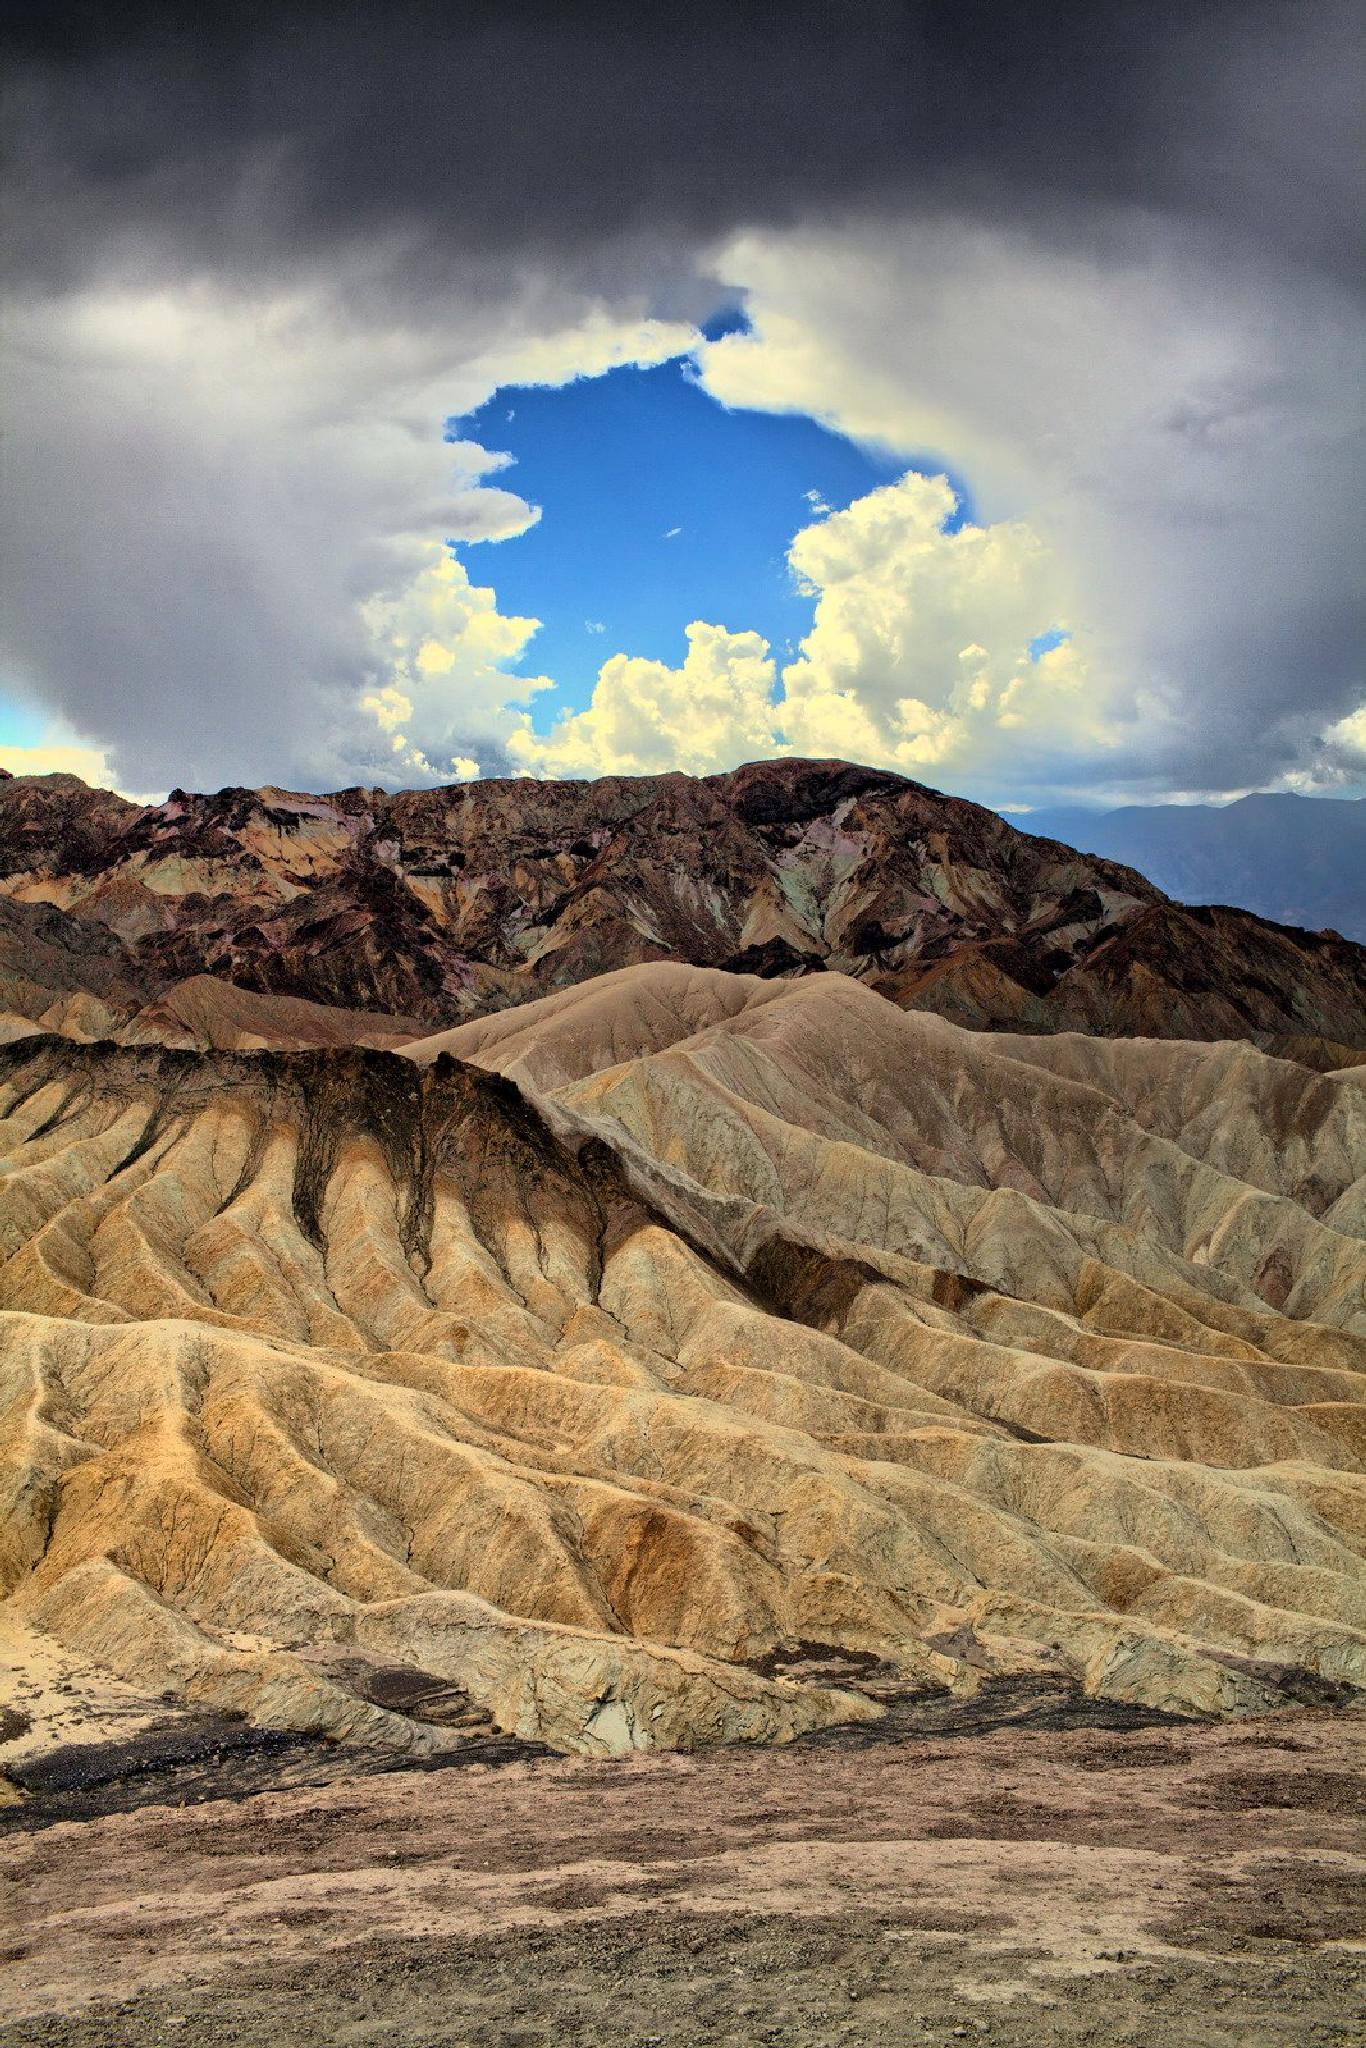 Hole in the sky. Zabriskie Point, Death Valley, California by Mikhail Rybakov